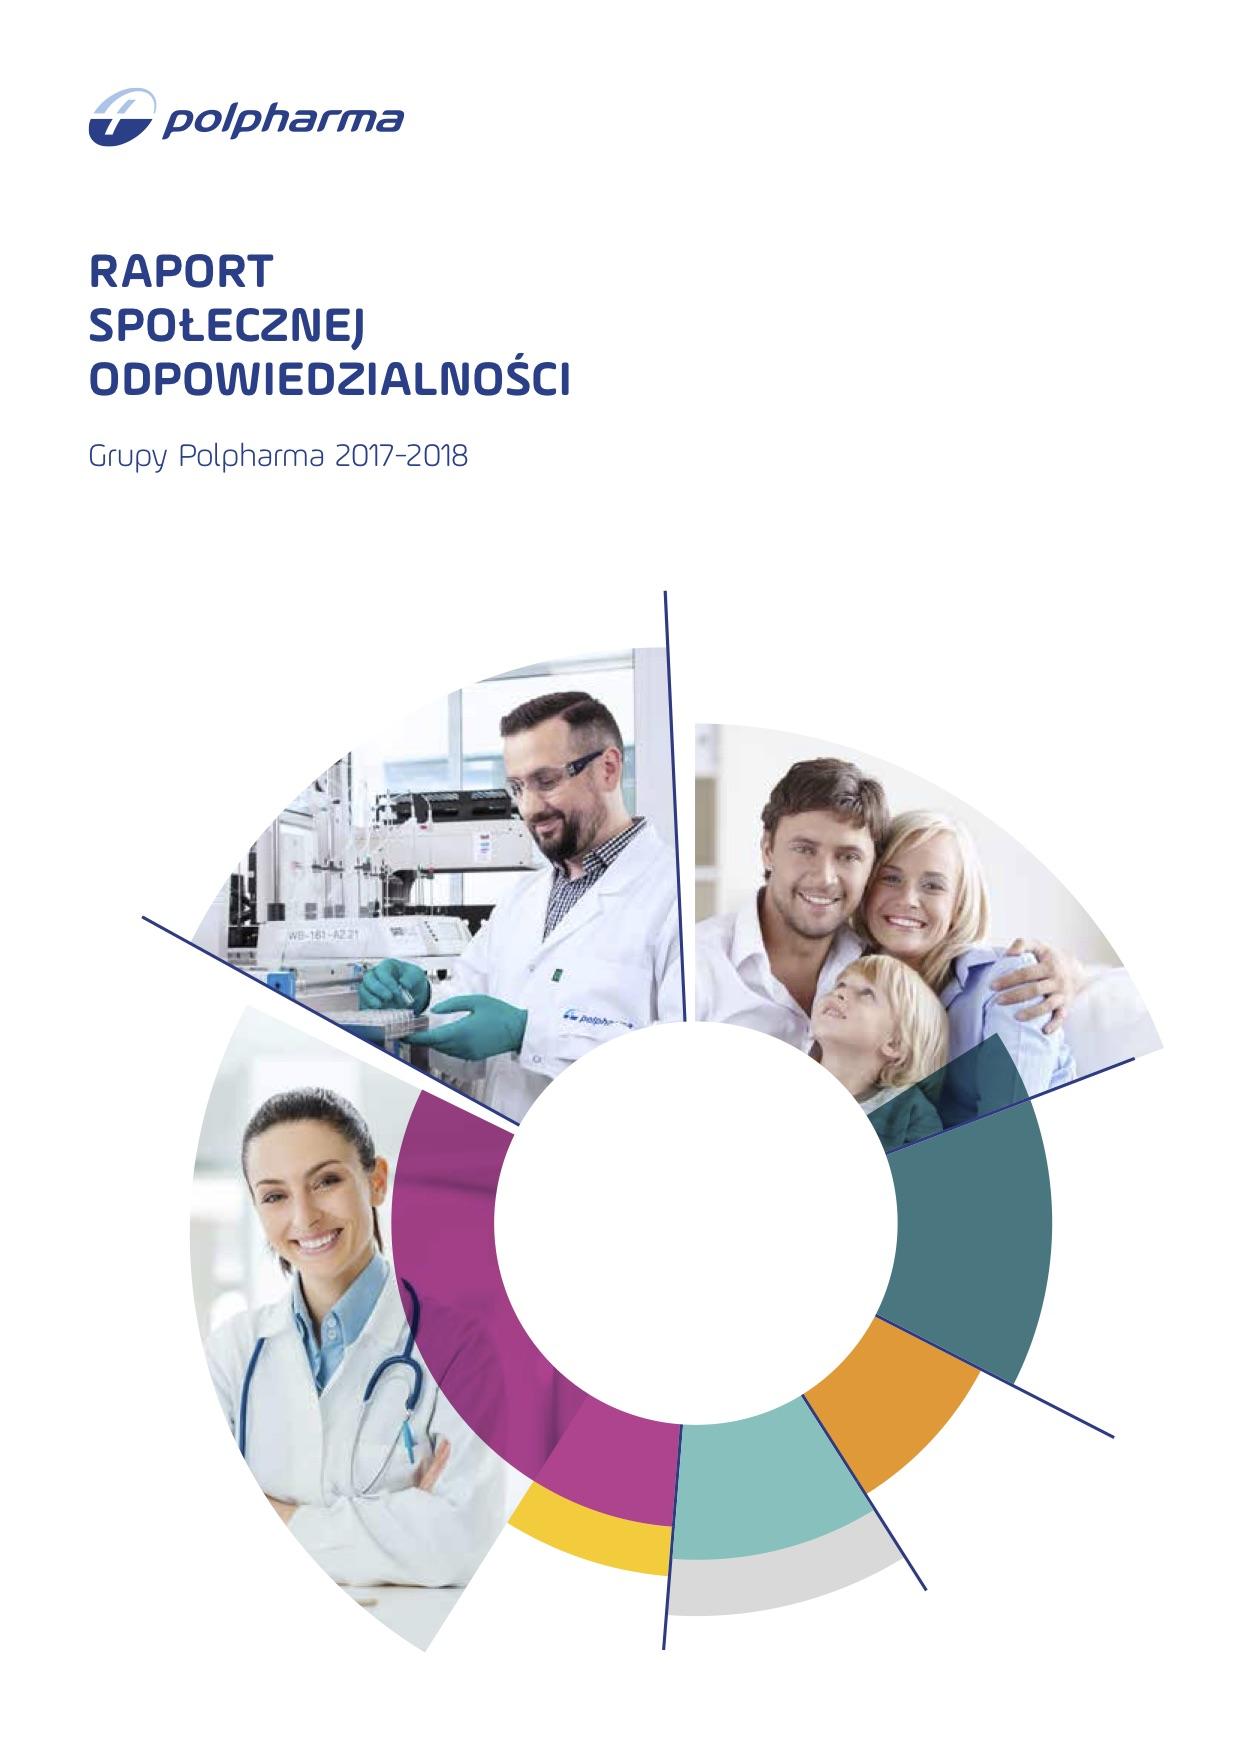 CSR Raport Polpharma 2017-2018 cover